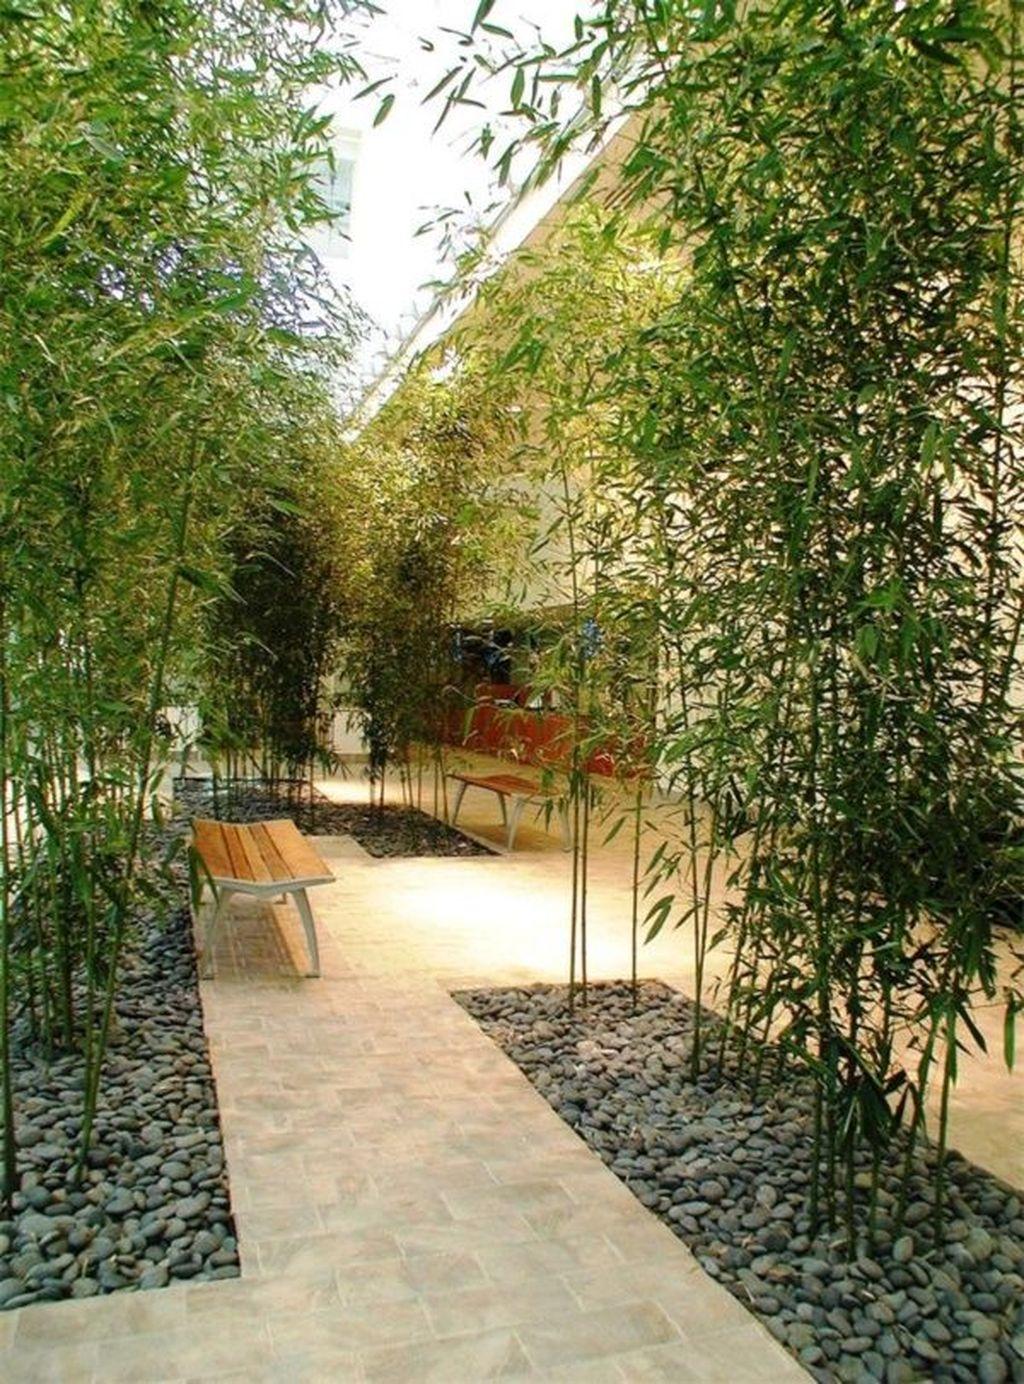 Inspiring Minimalist Garden Landscape Ideas That You Will Like 27